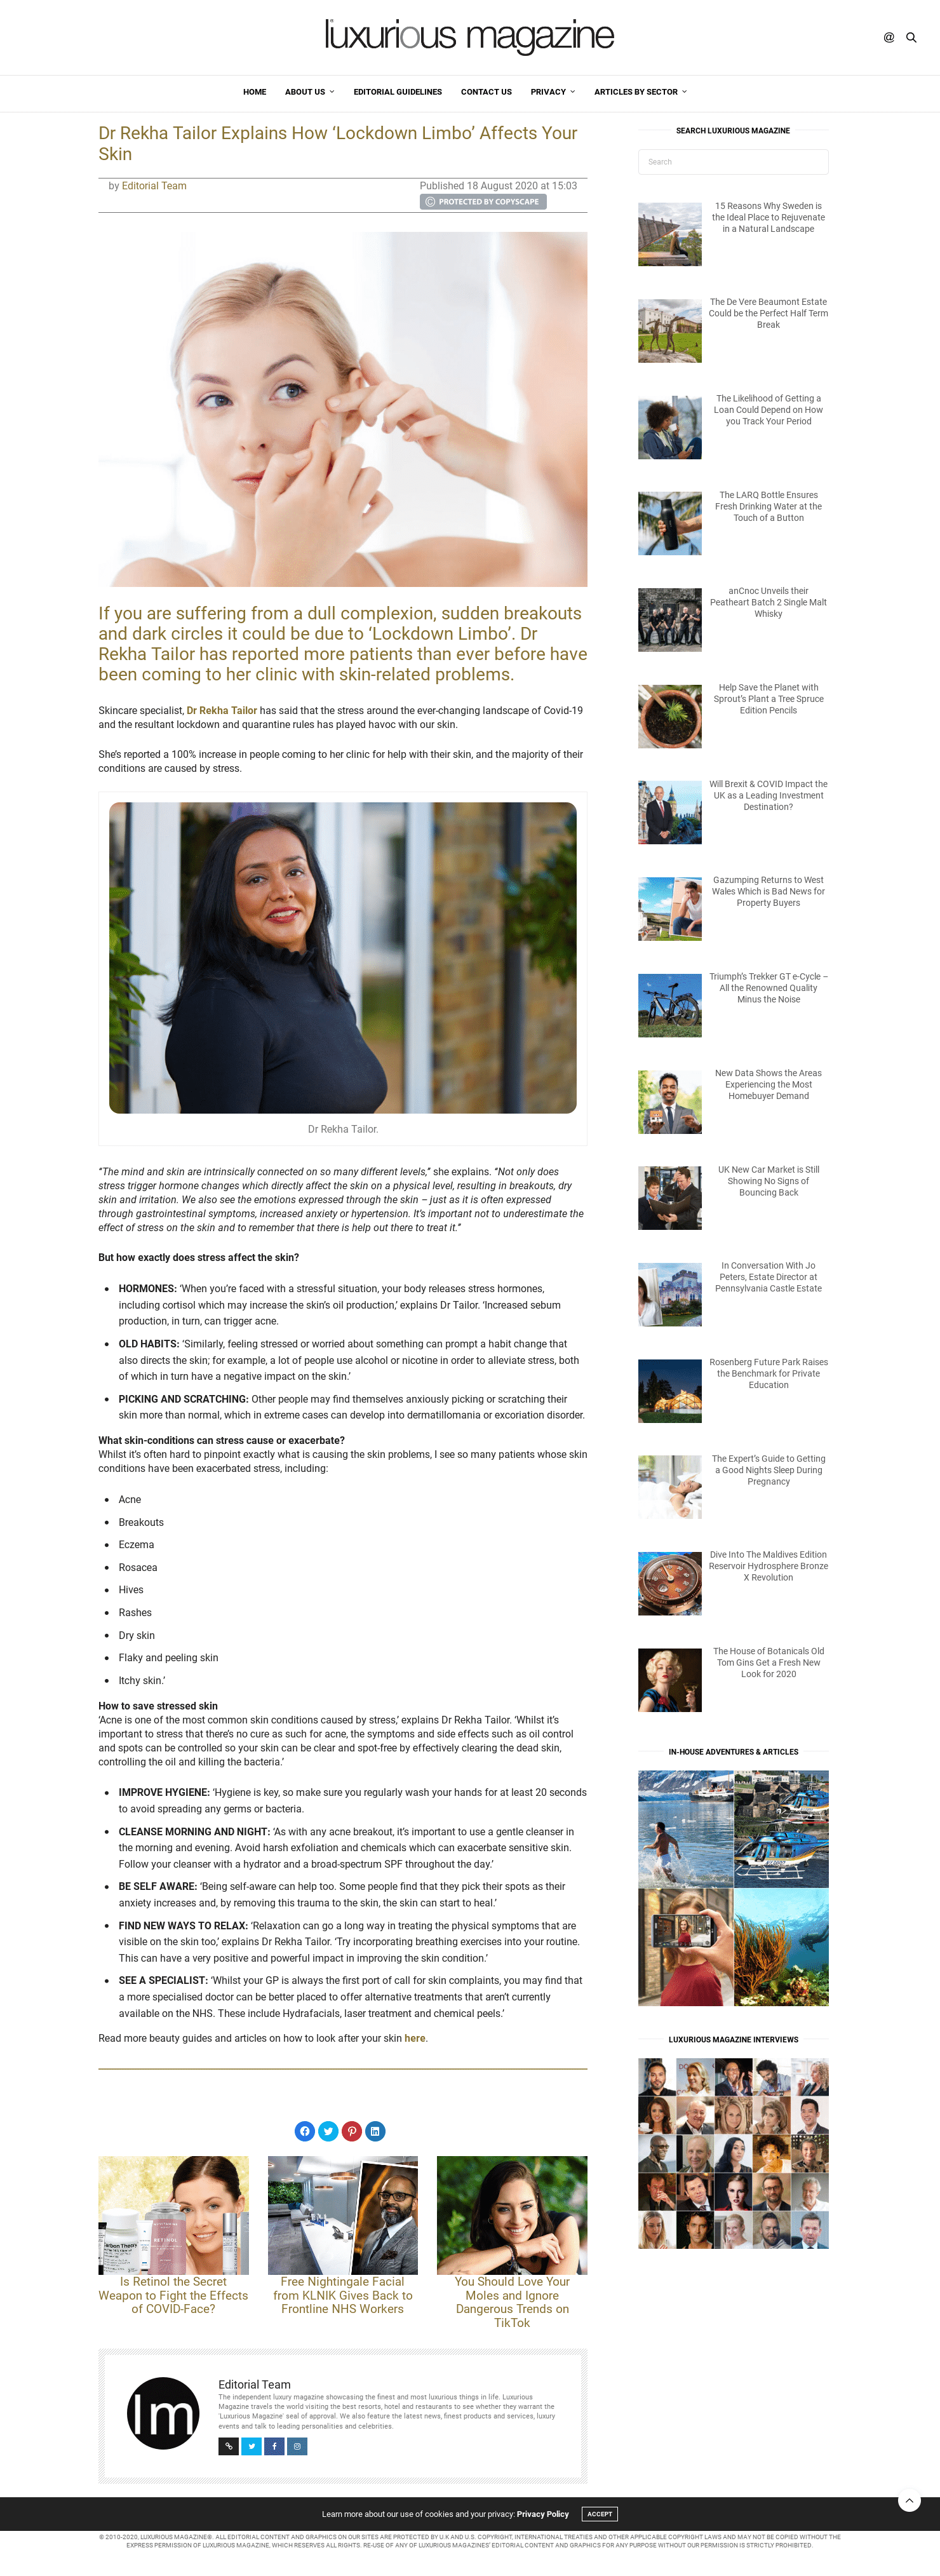 Luxurious Magazine - October 2020